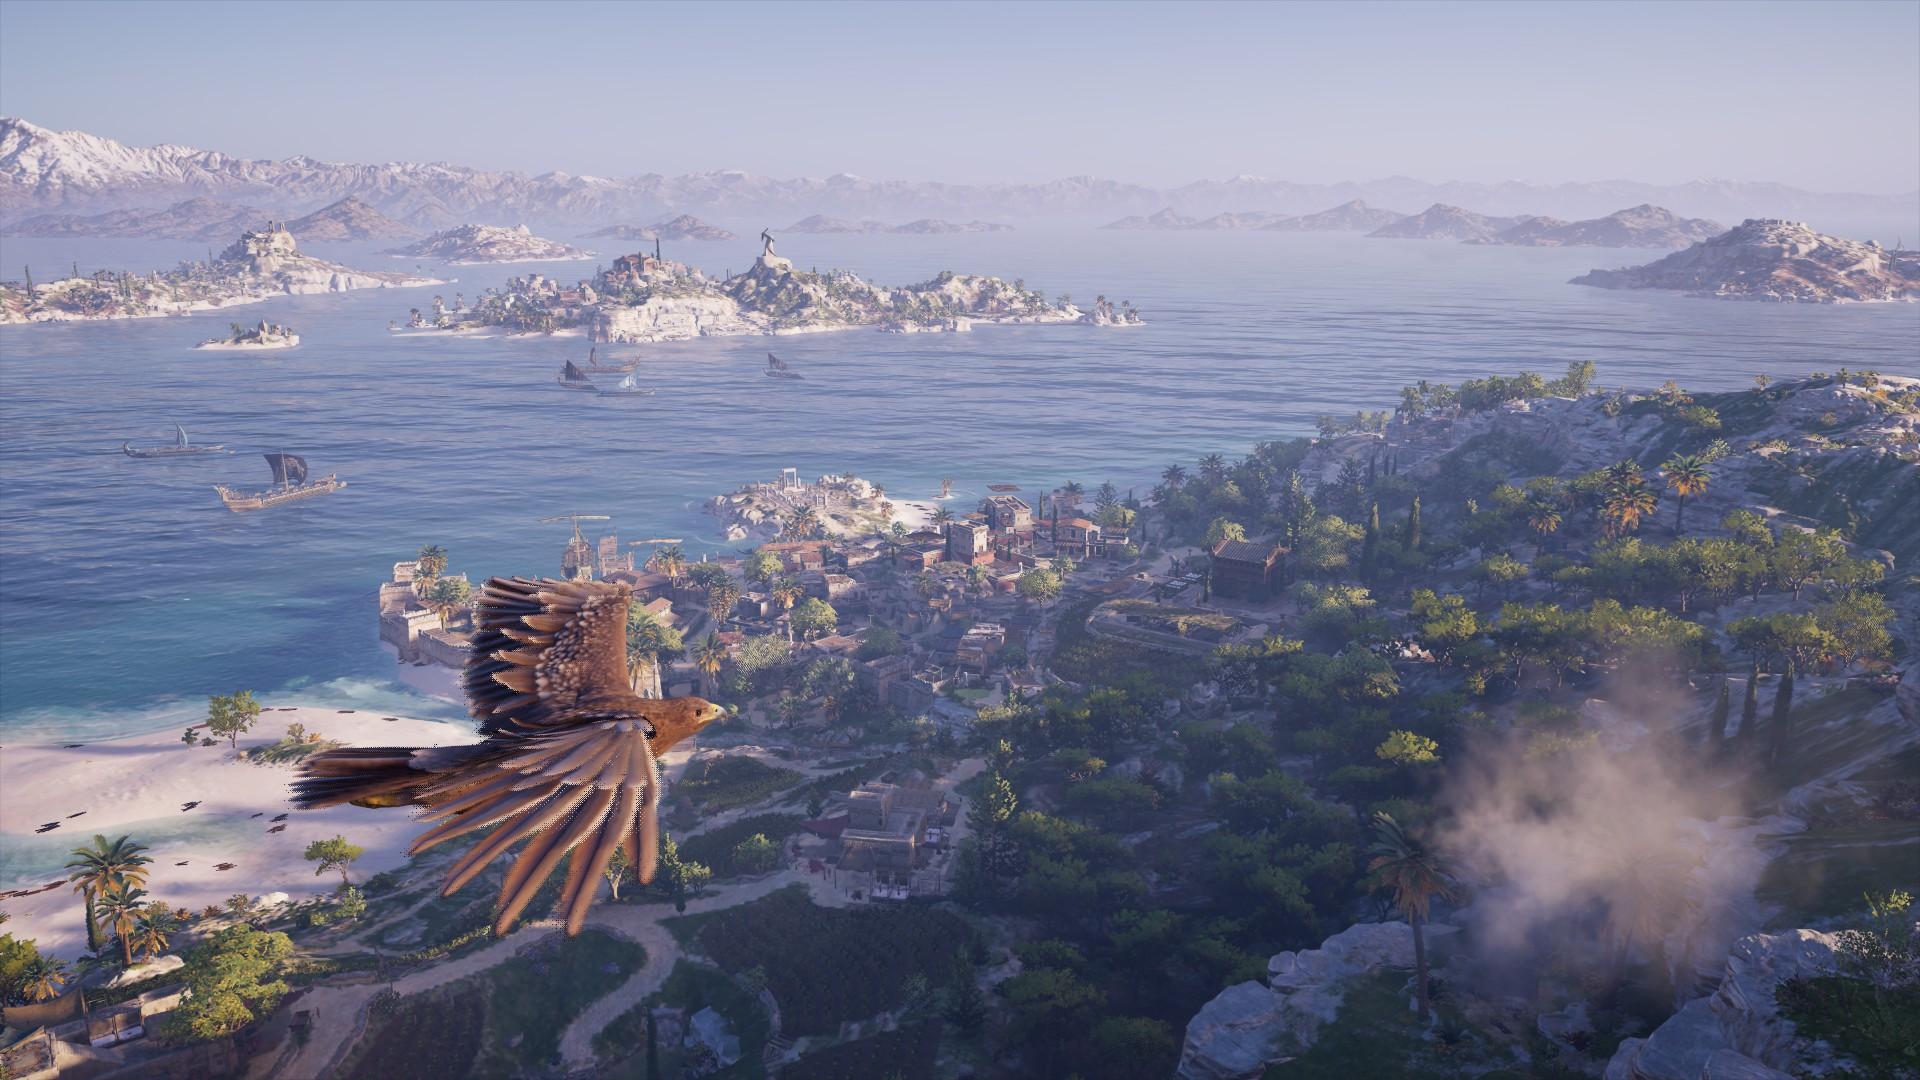 20181023013309_1.jpg - Assassin's Creed: Odyssey